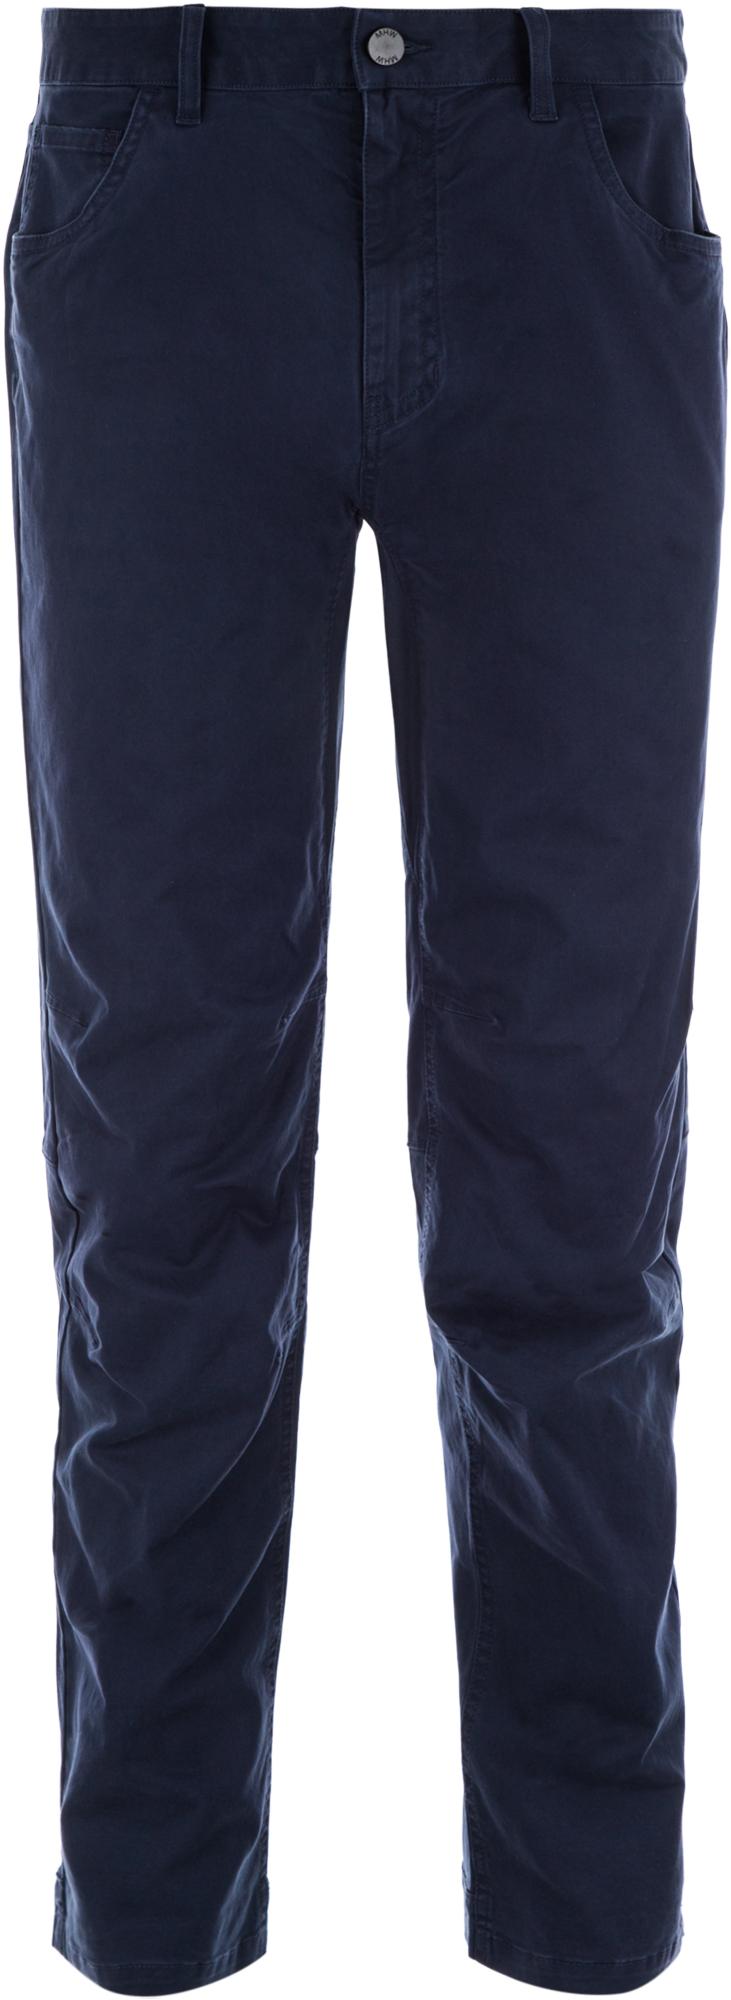 Mountain Hardwear Брюки мужские Mountain Hardwear Cederberg, размер 56 mountain